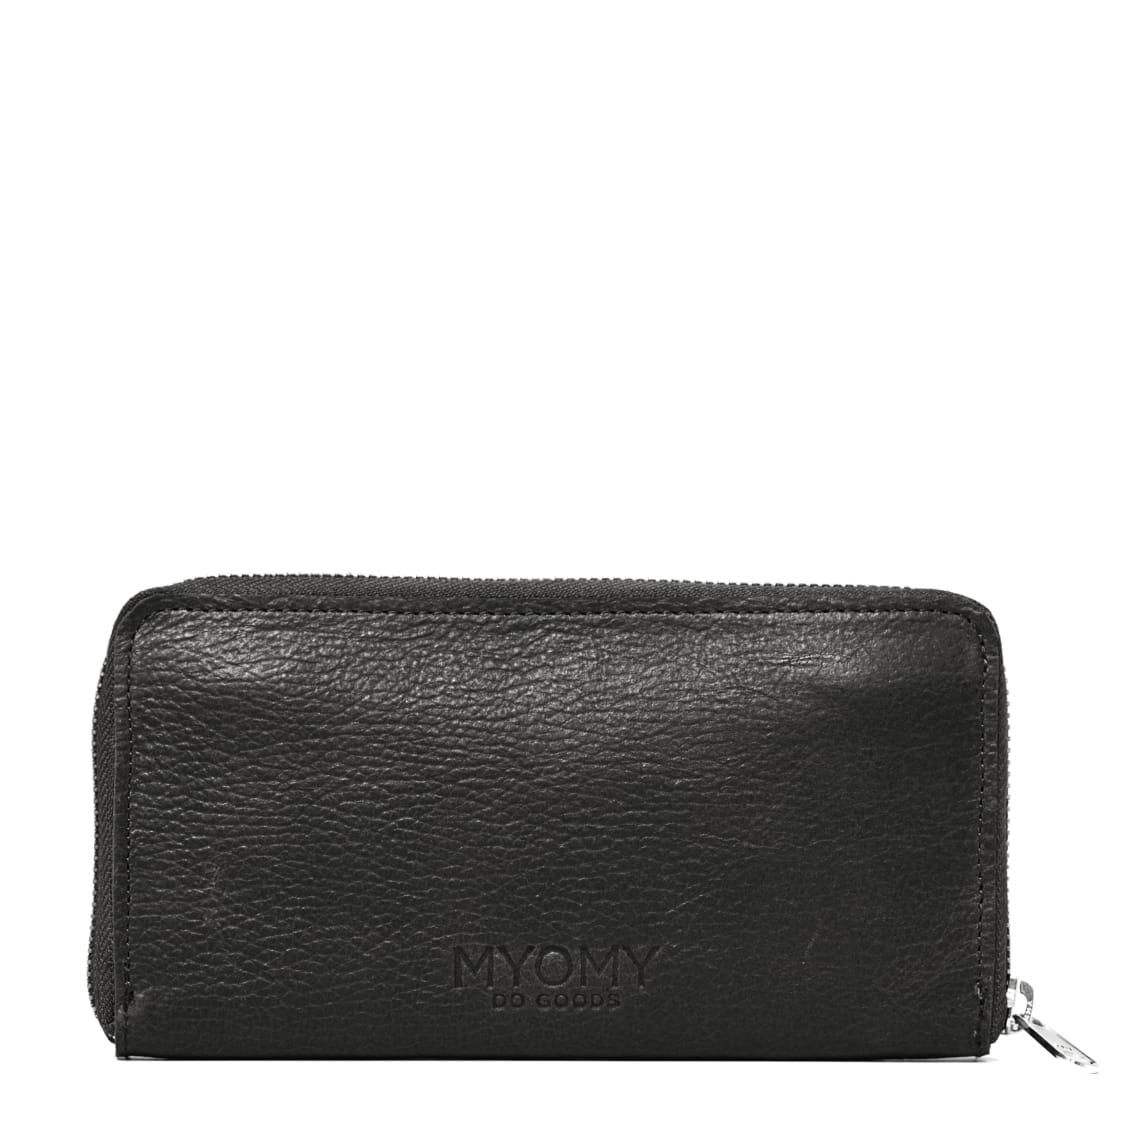 MY PAPER BAG Wallet Large (RFID) - rambler black